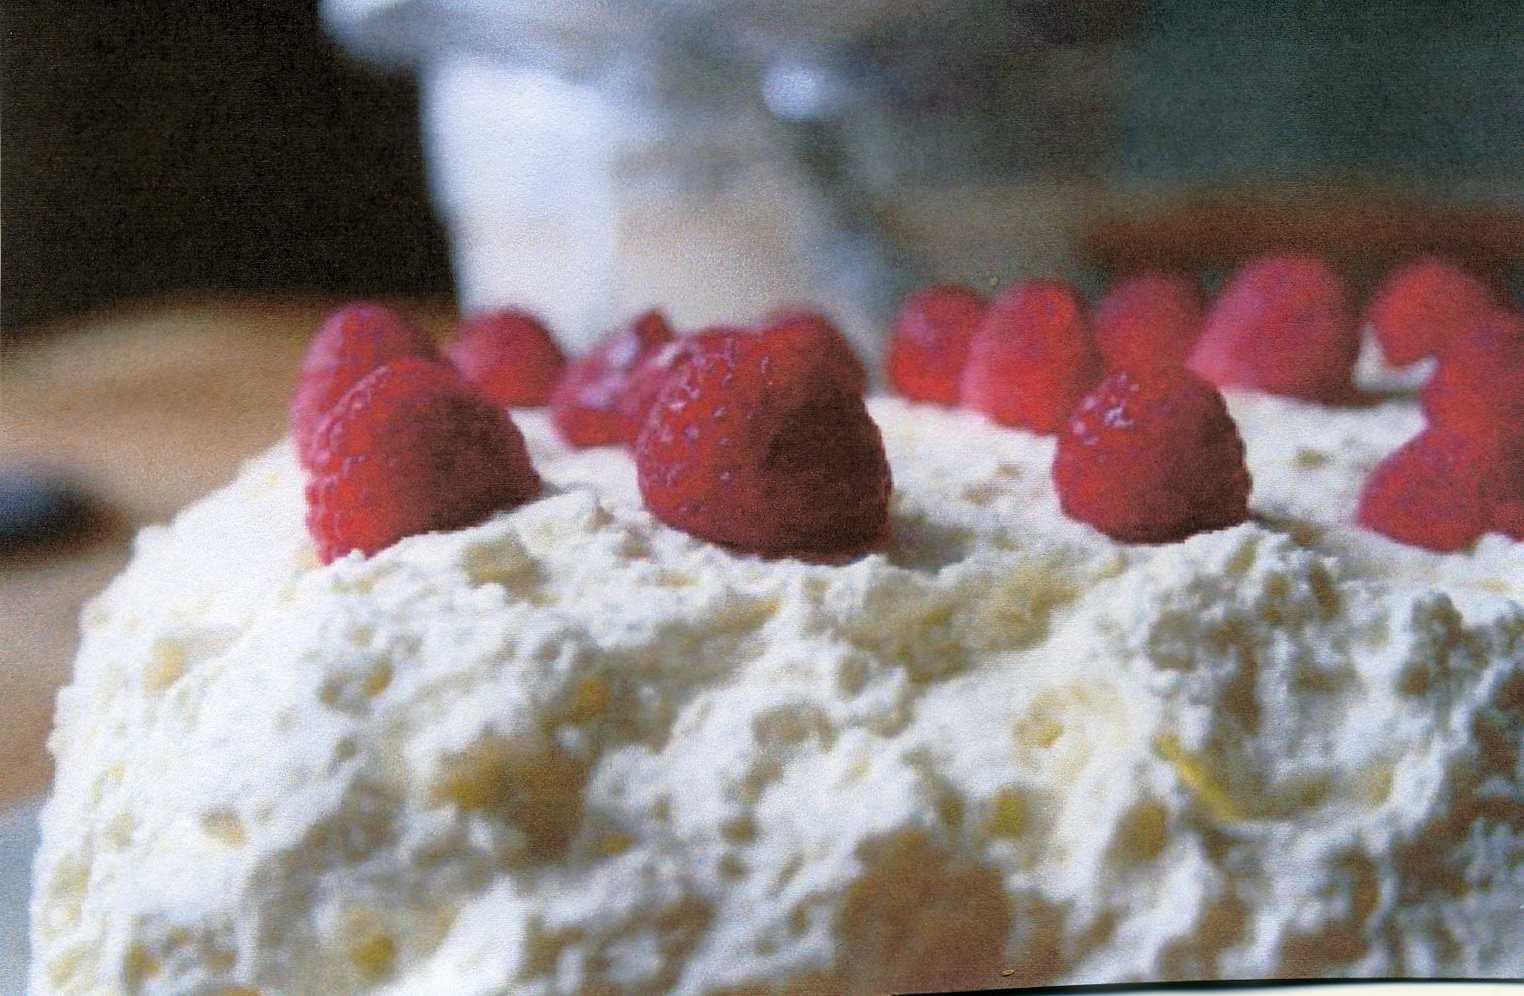 tårtbotten med mandelmjöl